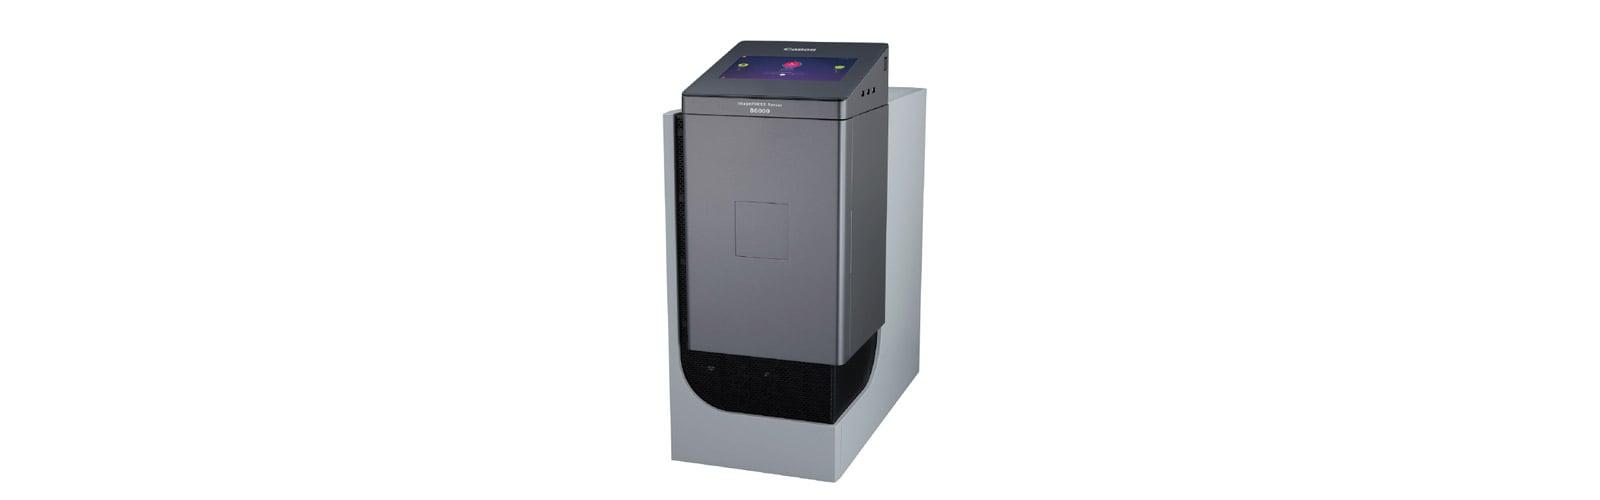 Canon-imagePRESS-Server-B6000